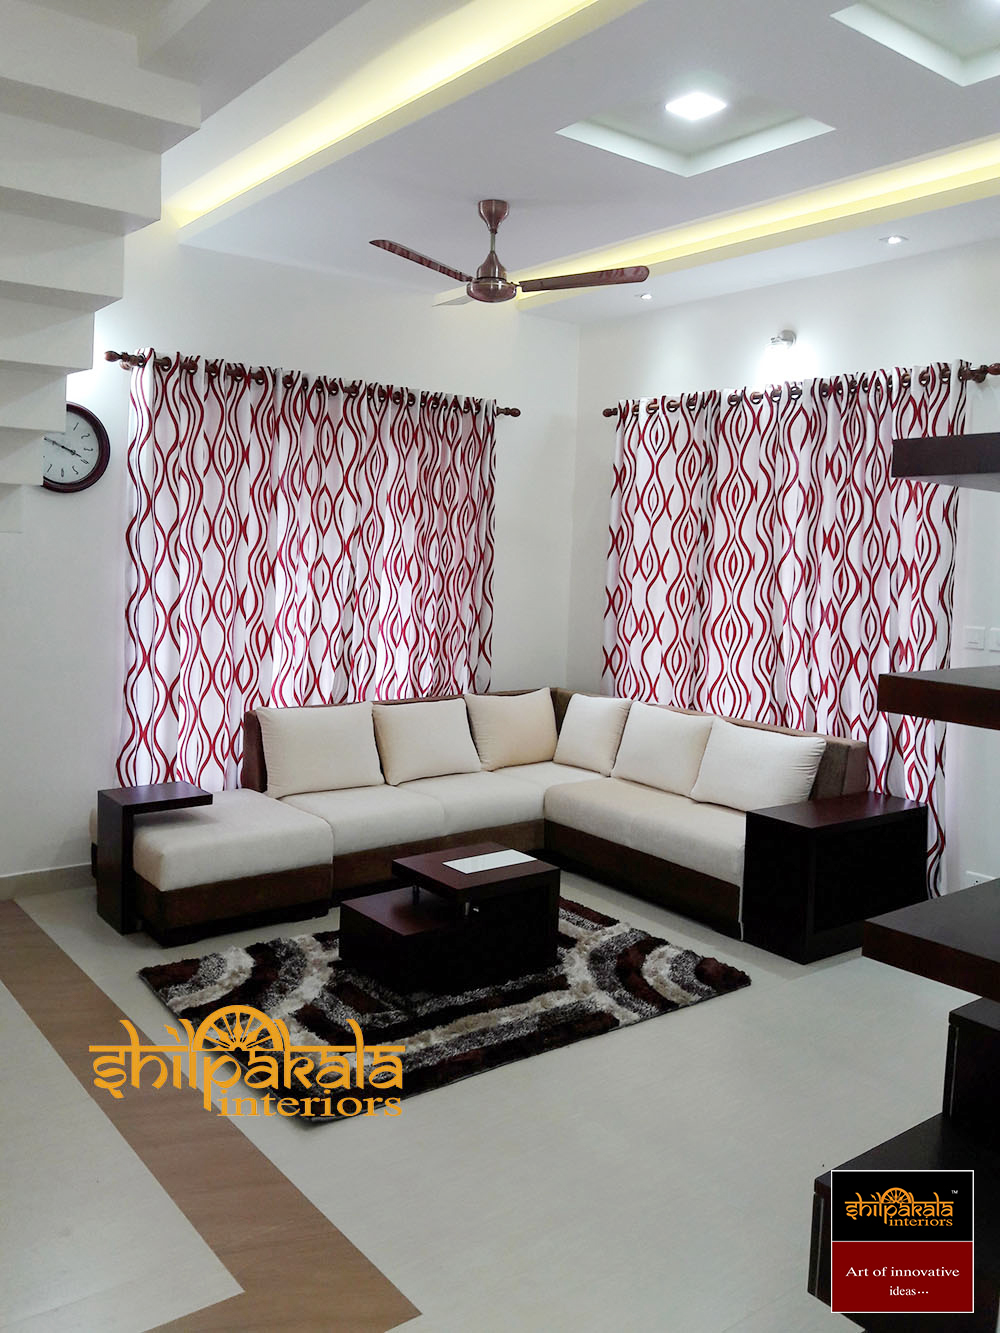 Kerala House Interior Design: Home Interior Designs - Image Gallery